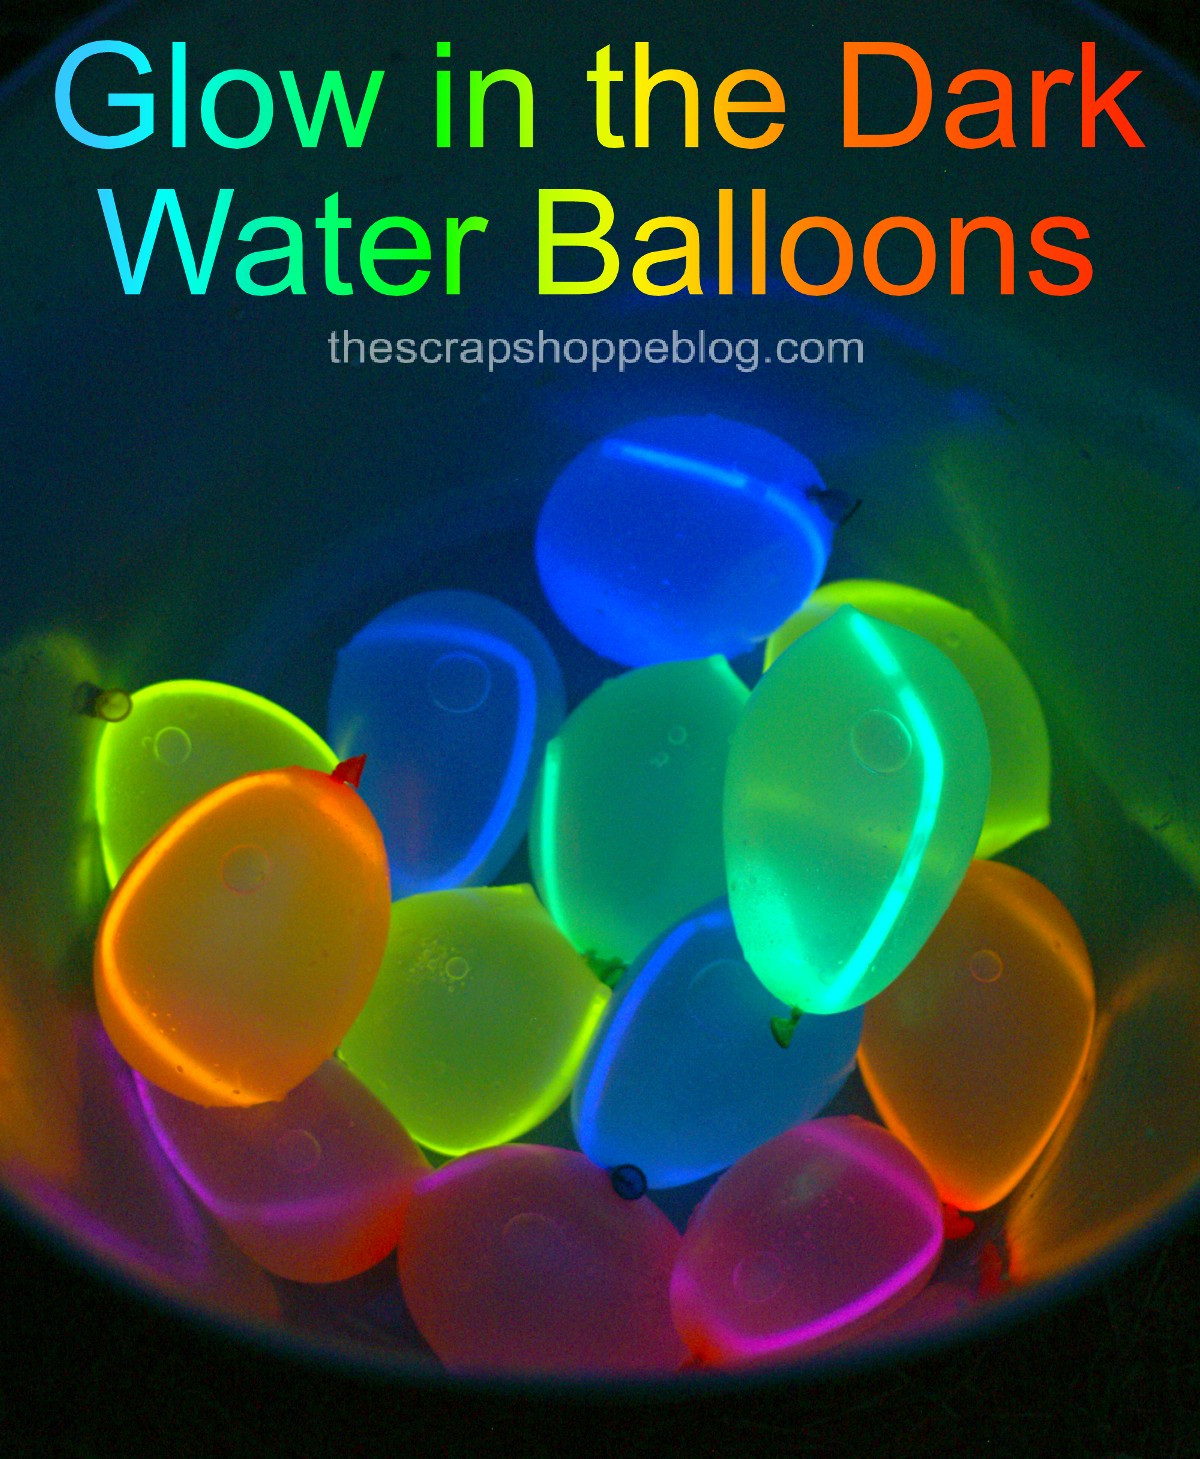 Glow Pool Party Ideas  Balloon Hacks